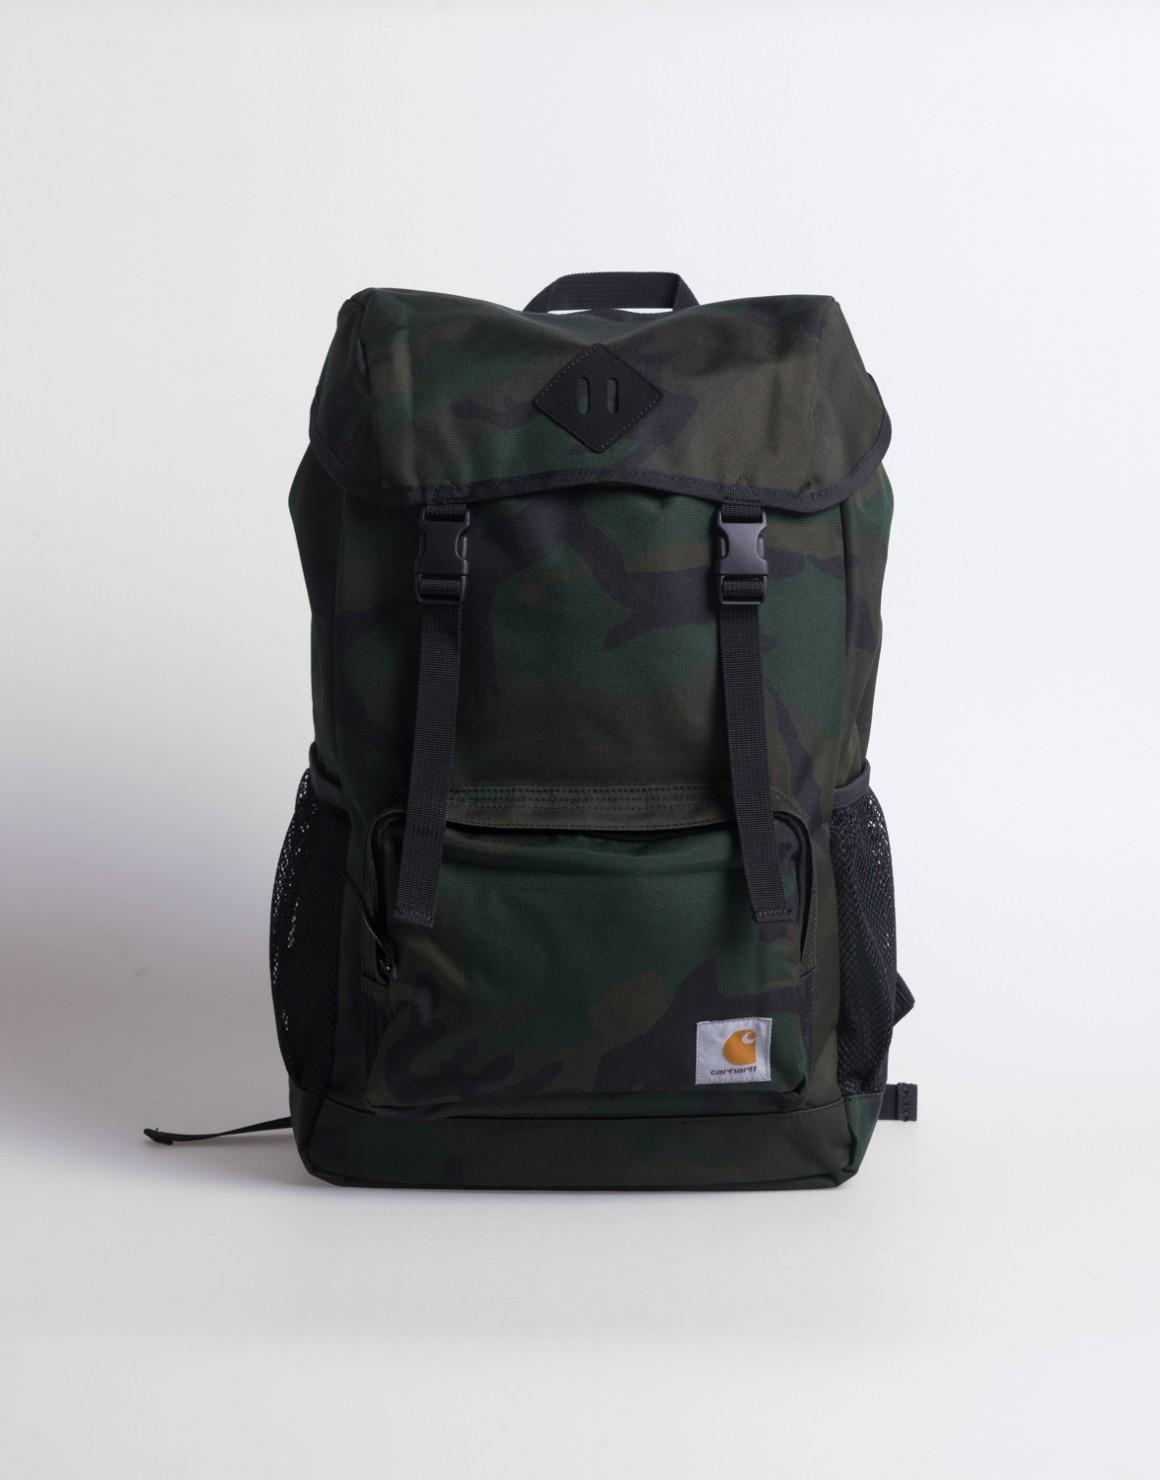 Gard Backpack